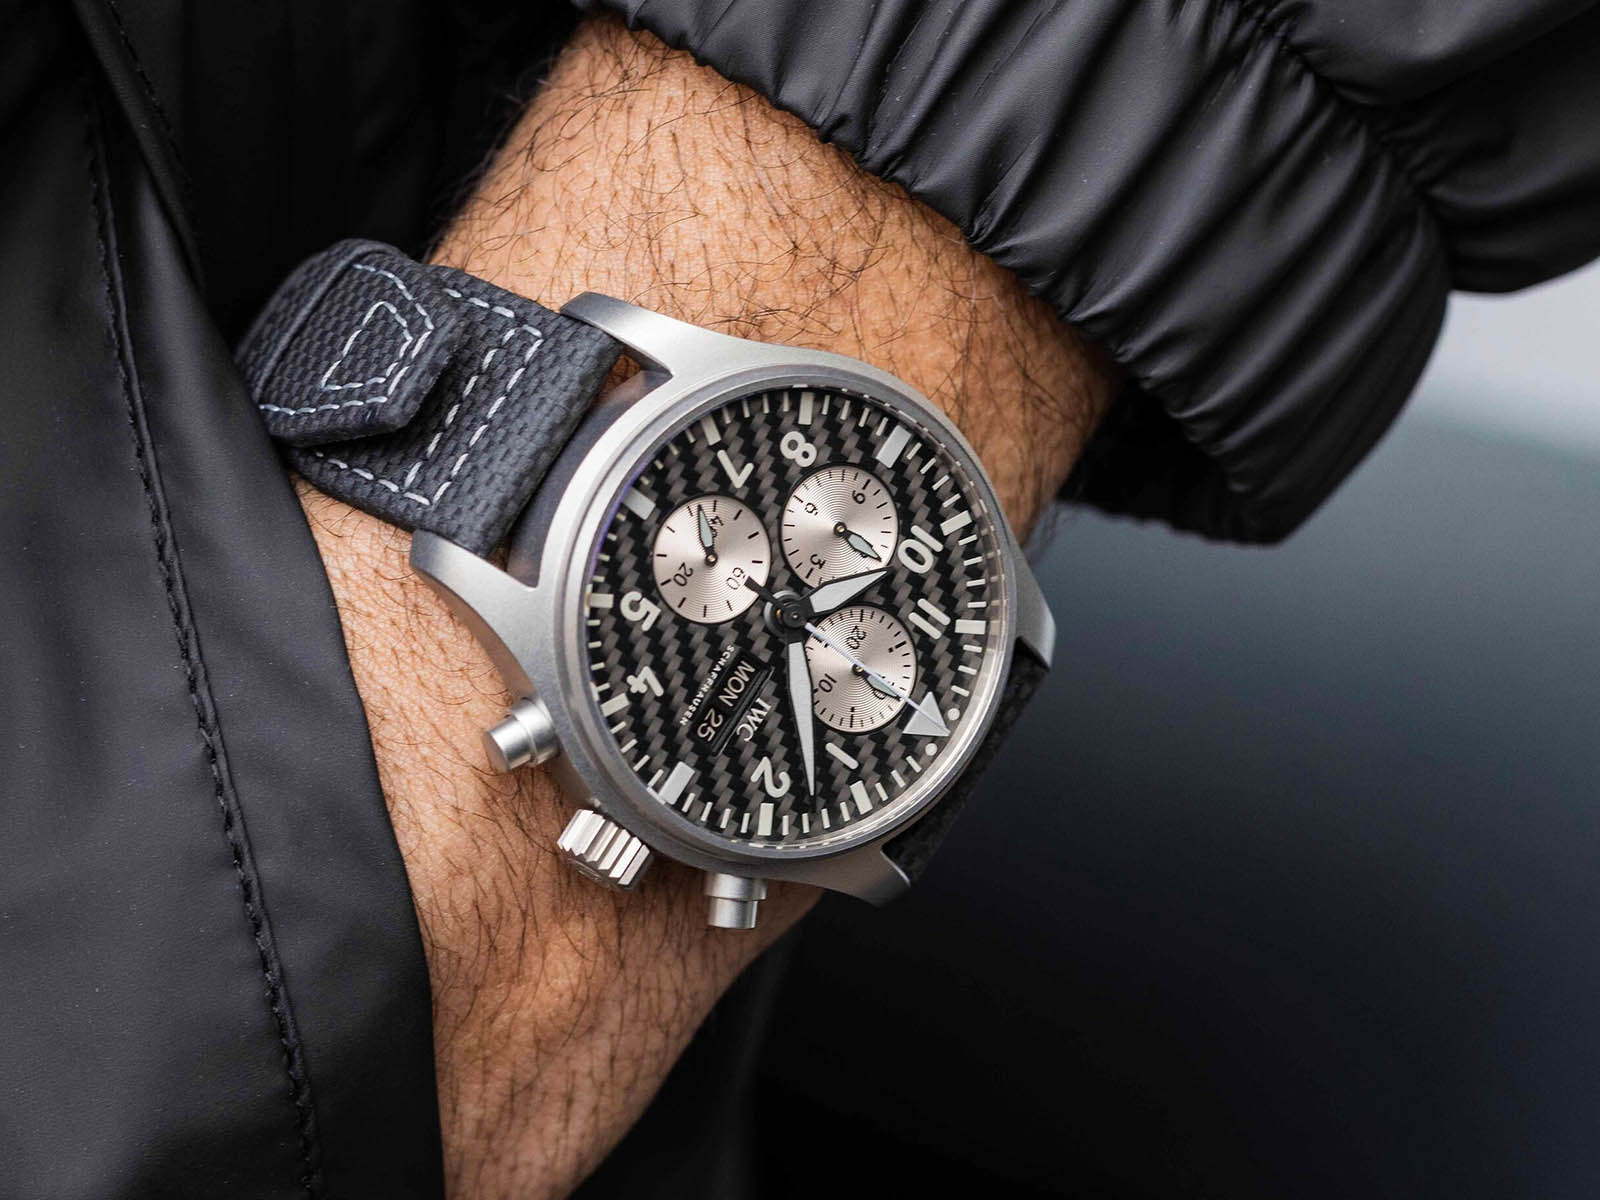 iw377903-iwc-pilot-s-watch-chronograph-edition-amg-2.jpg